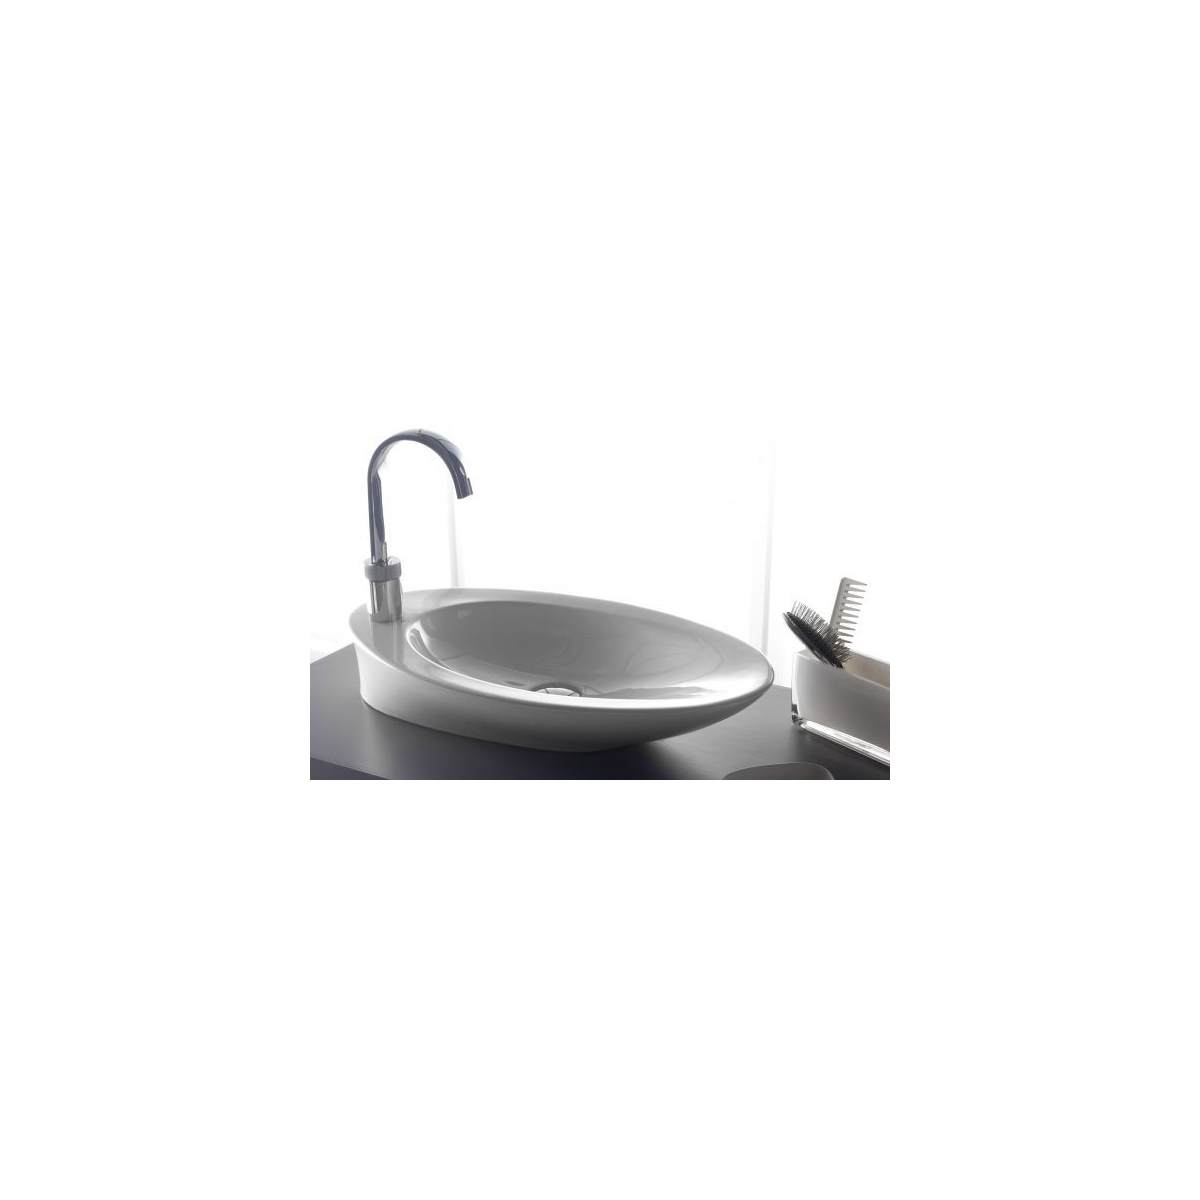 Lavabo Oval Pure The Bathco